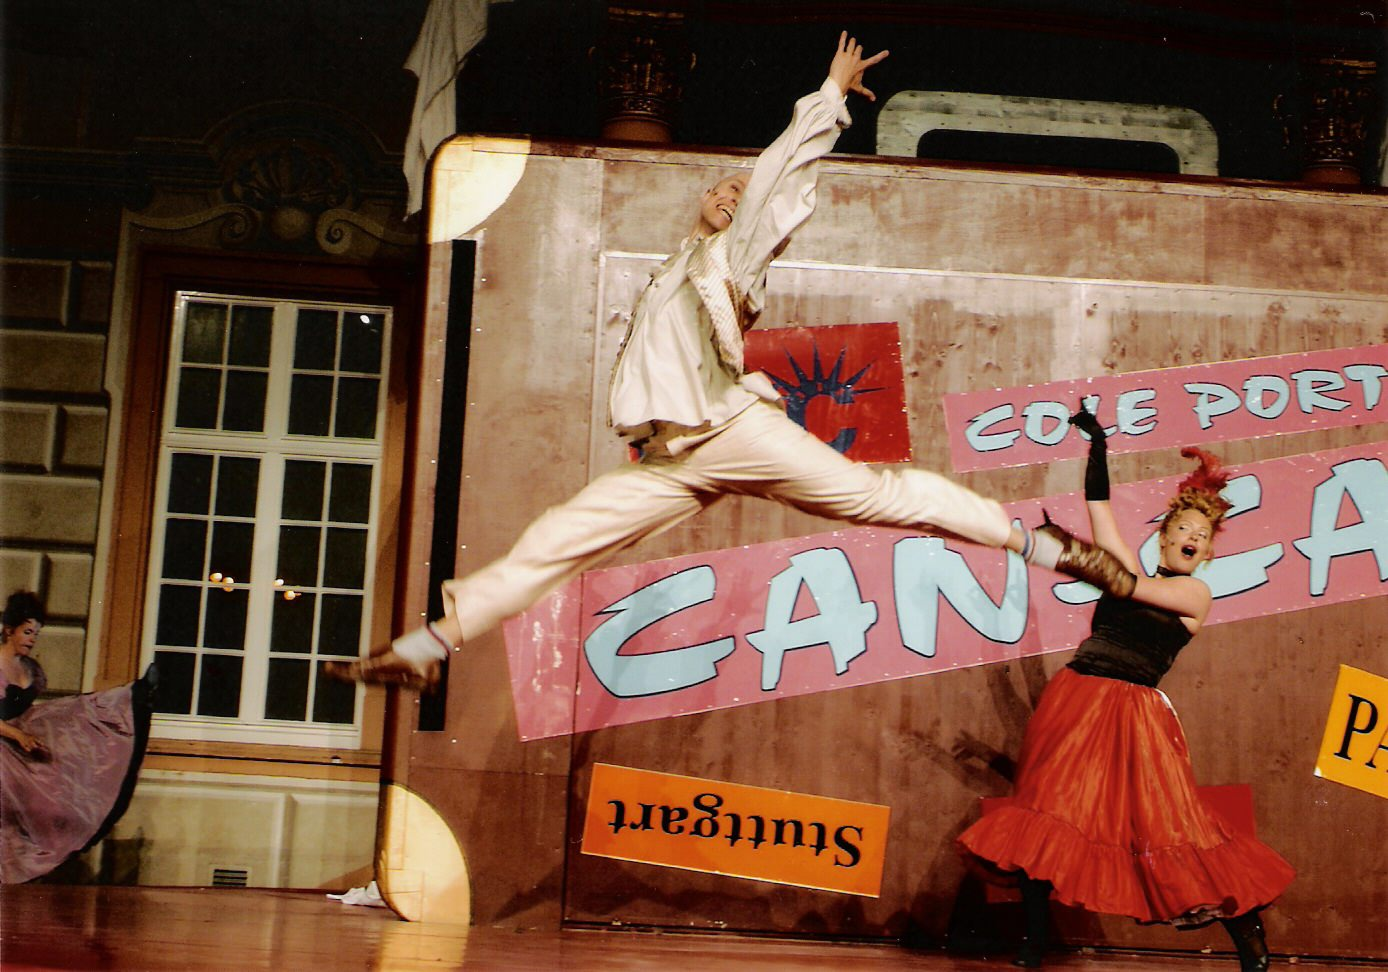 CAN CAN (Ettlingen)